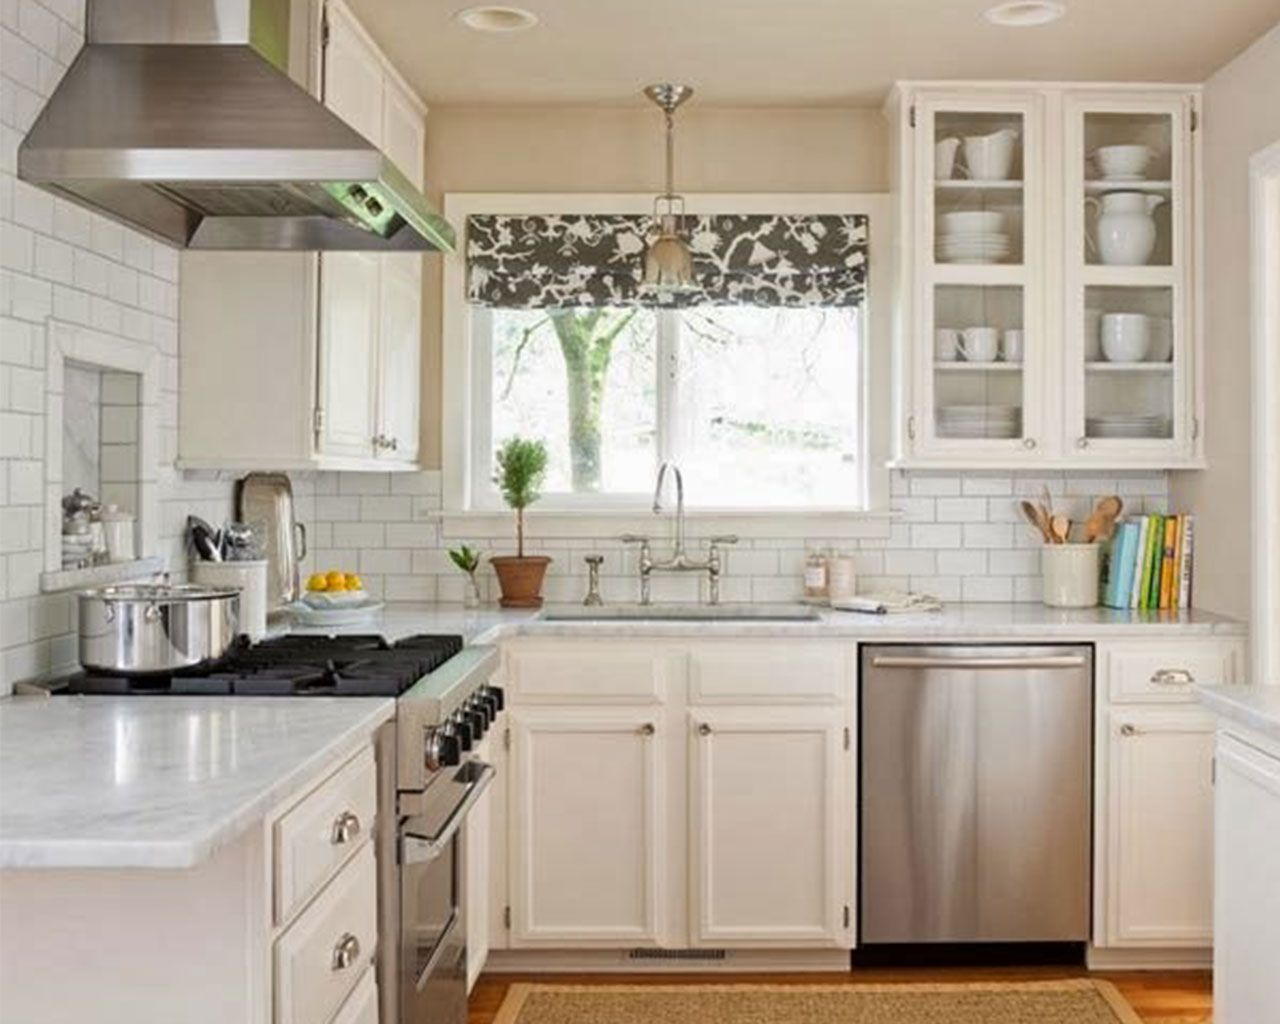 Kitchen Design Ideas Prasada Kitchens And Fine Cabinetry Kitchen Design Classic White Kitchen Kitchen Remodel